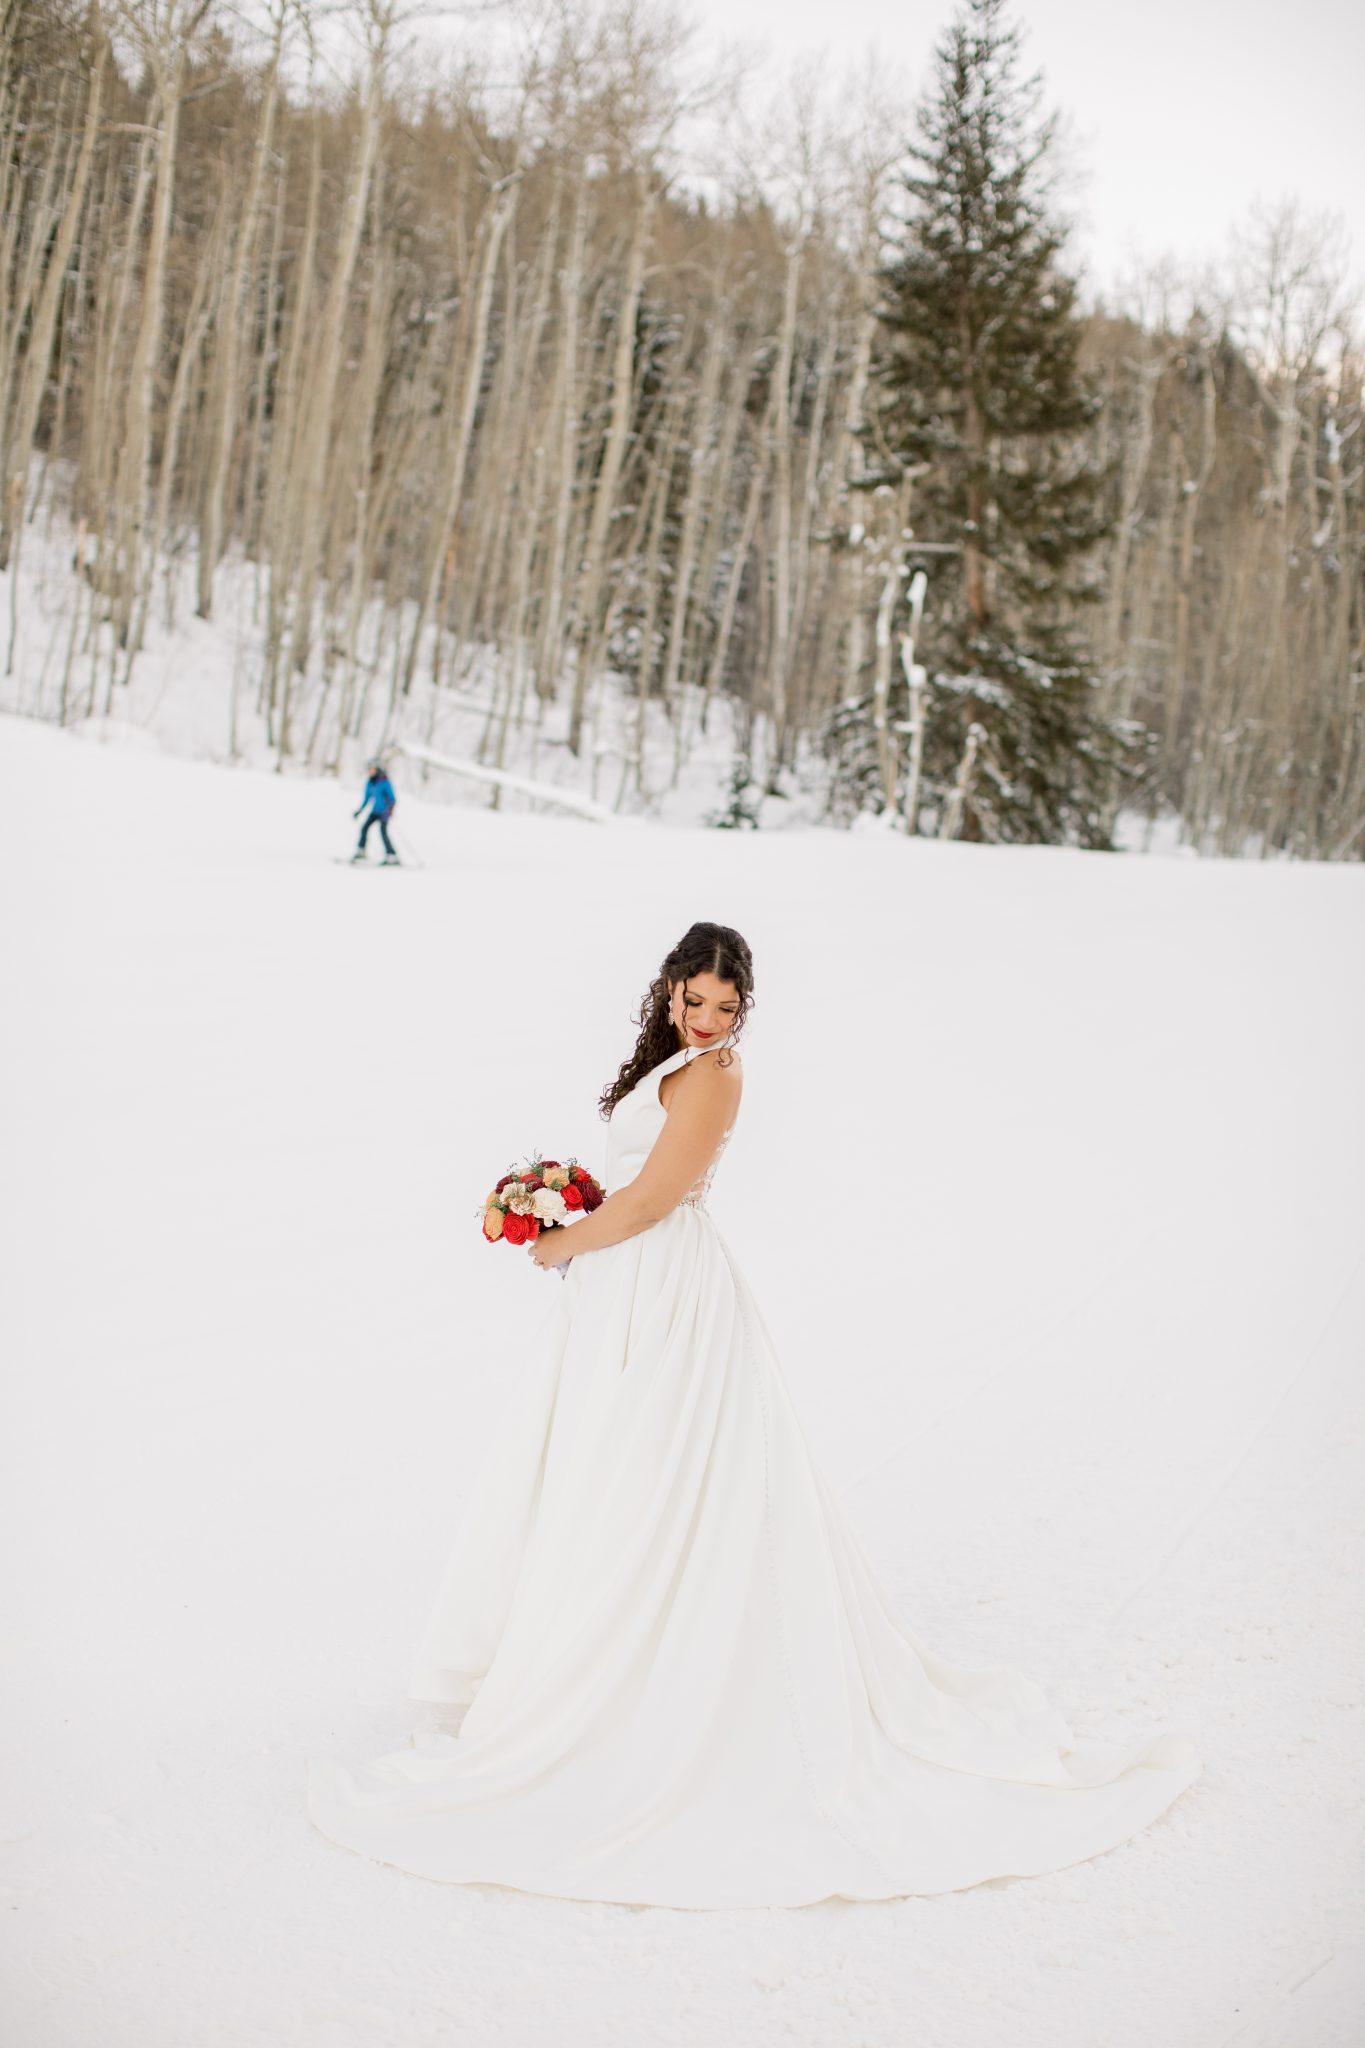 Winter Wedding with skiing at Beaver Creek Ski Resort